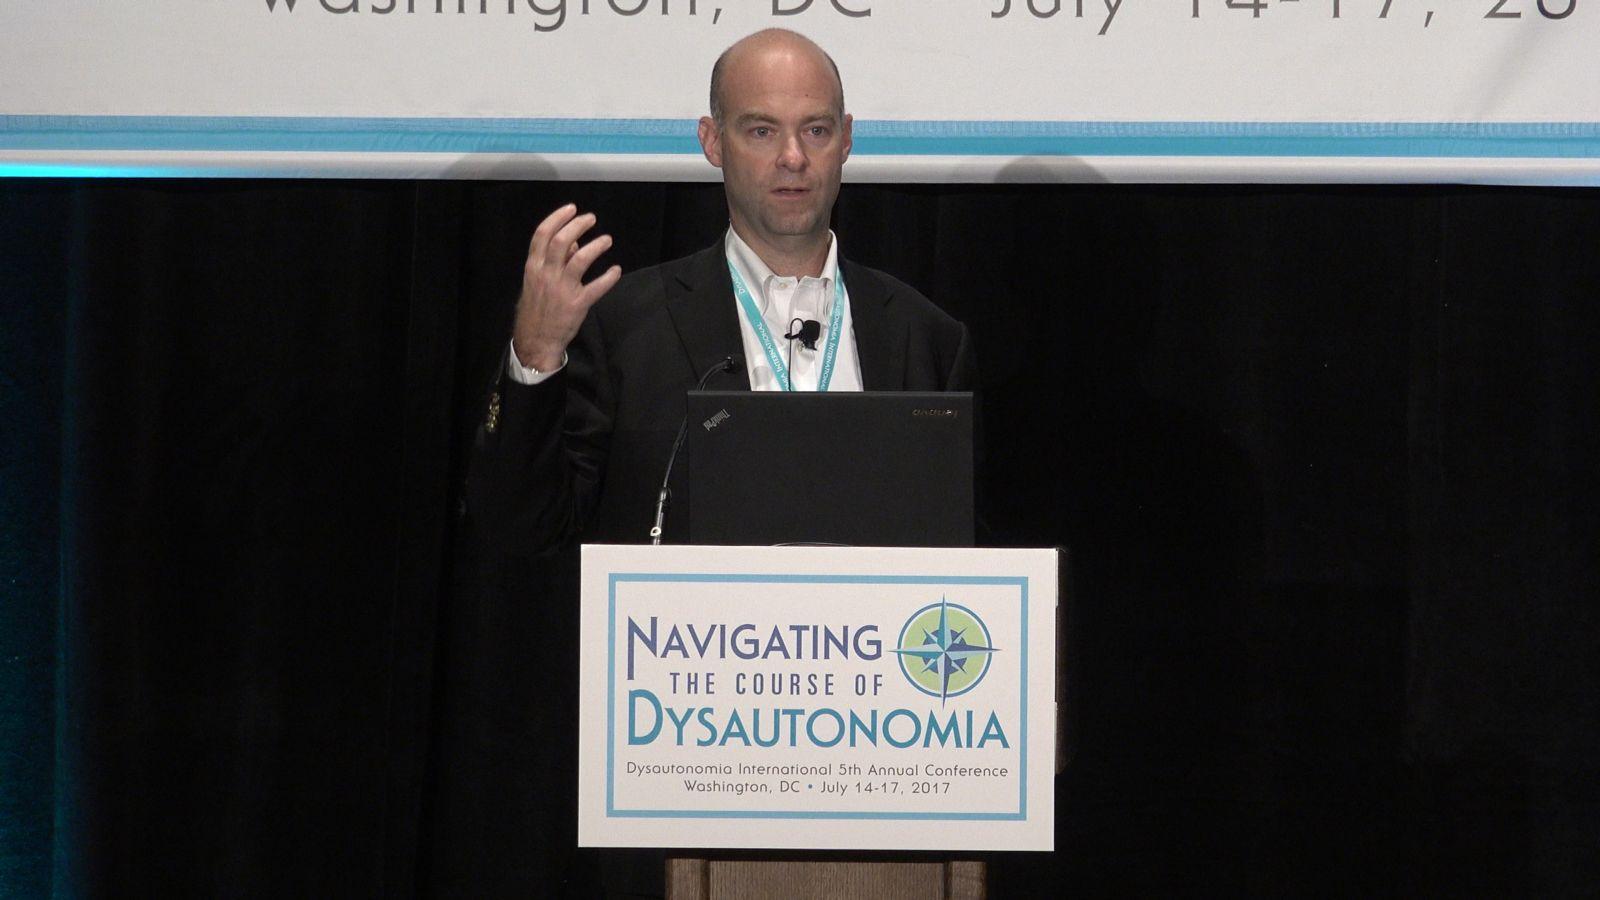 Dysautonomia Conference